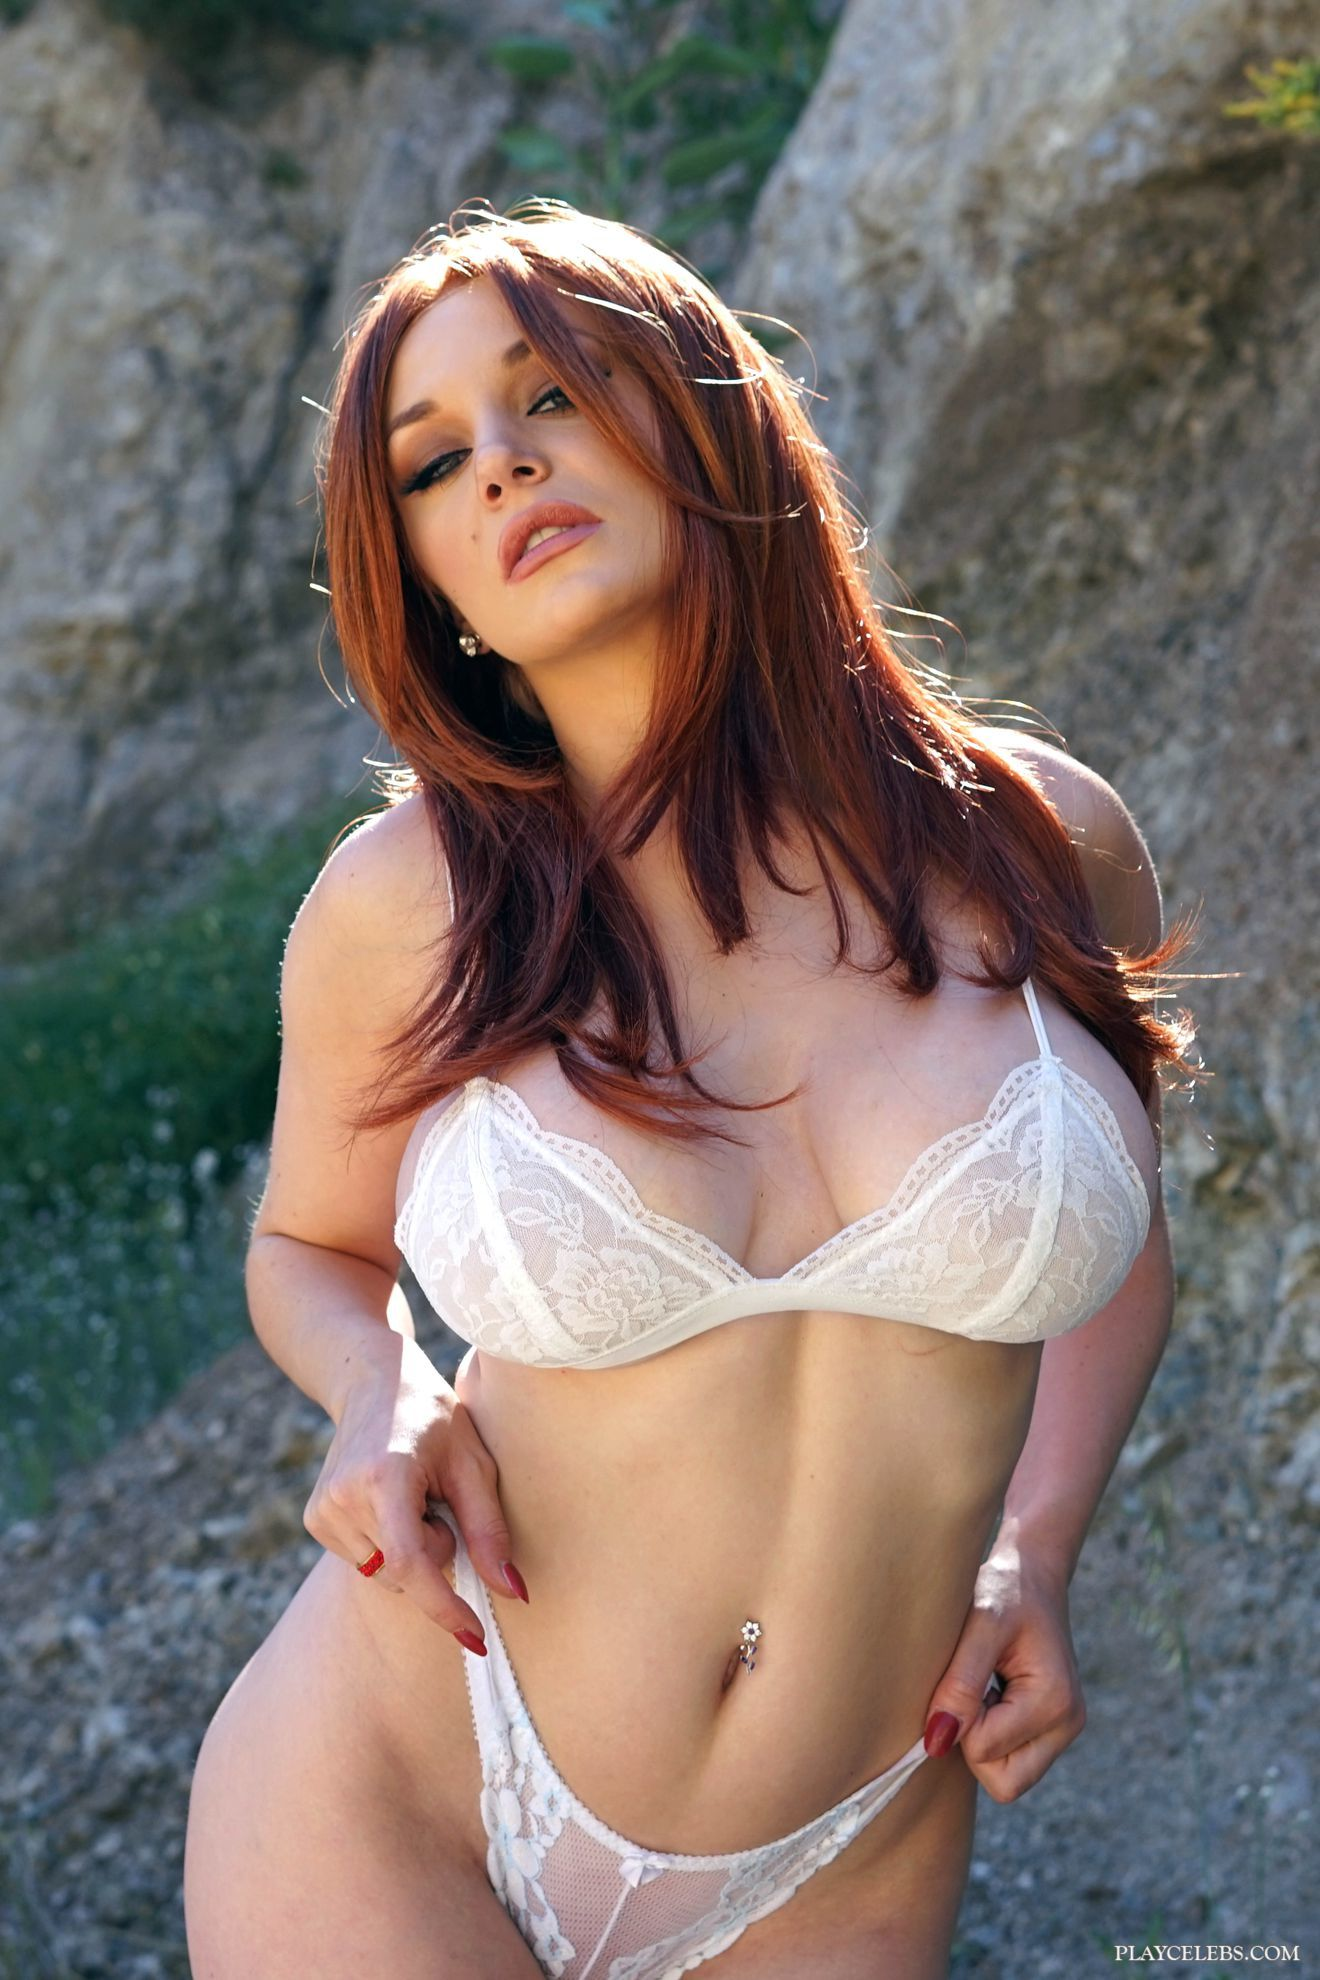 Busty Celeb Courtney Stodden Posing In Hot Lacy Lingerie